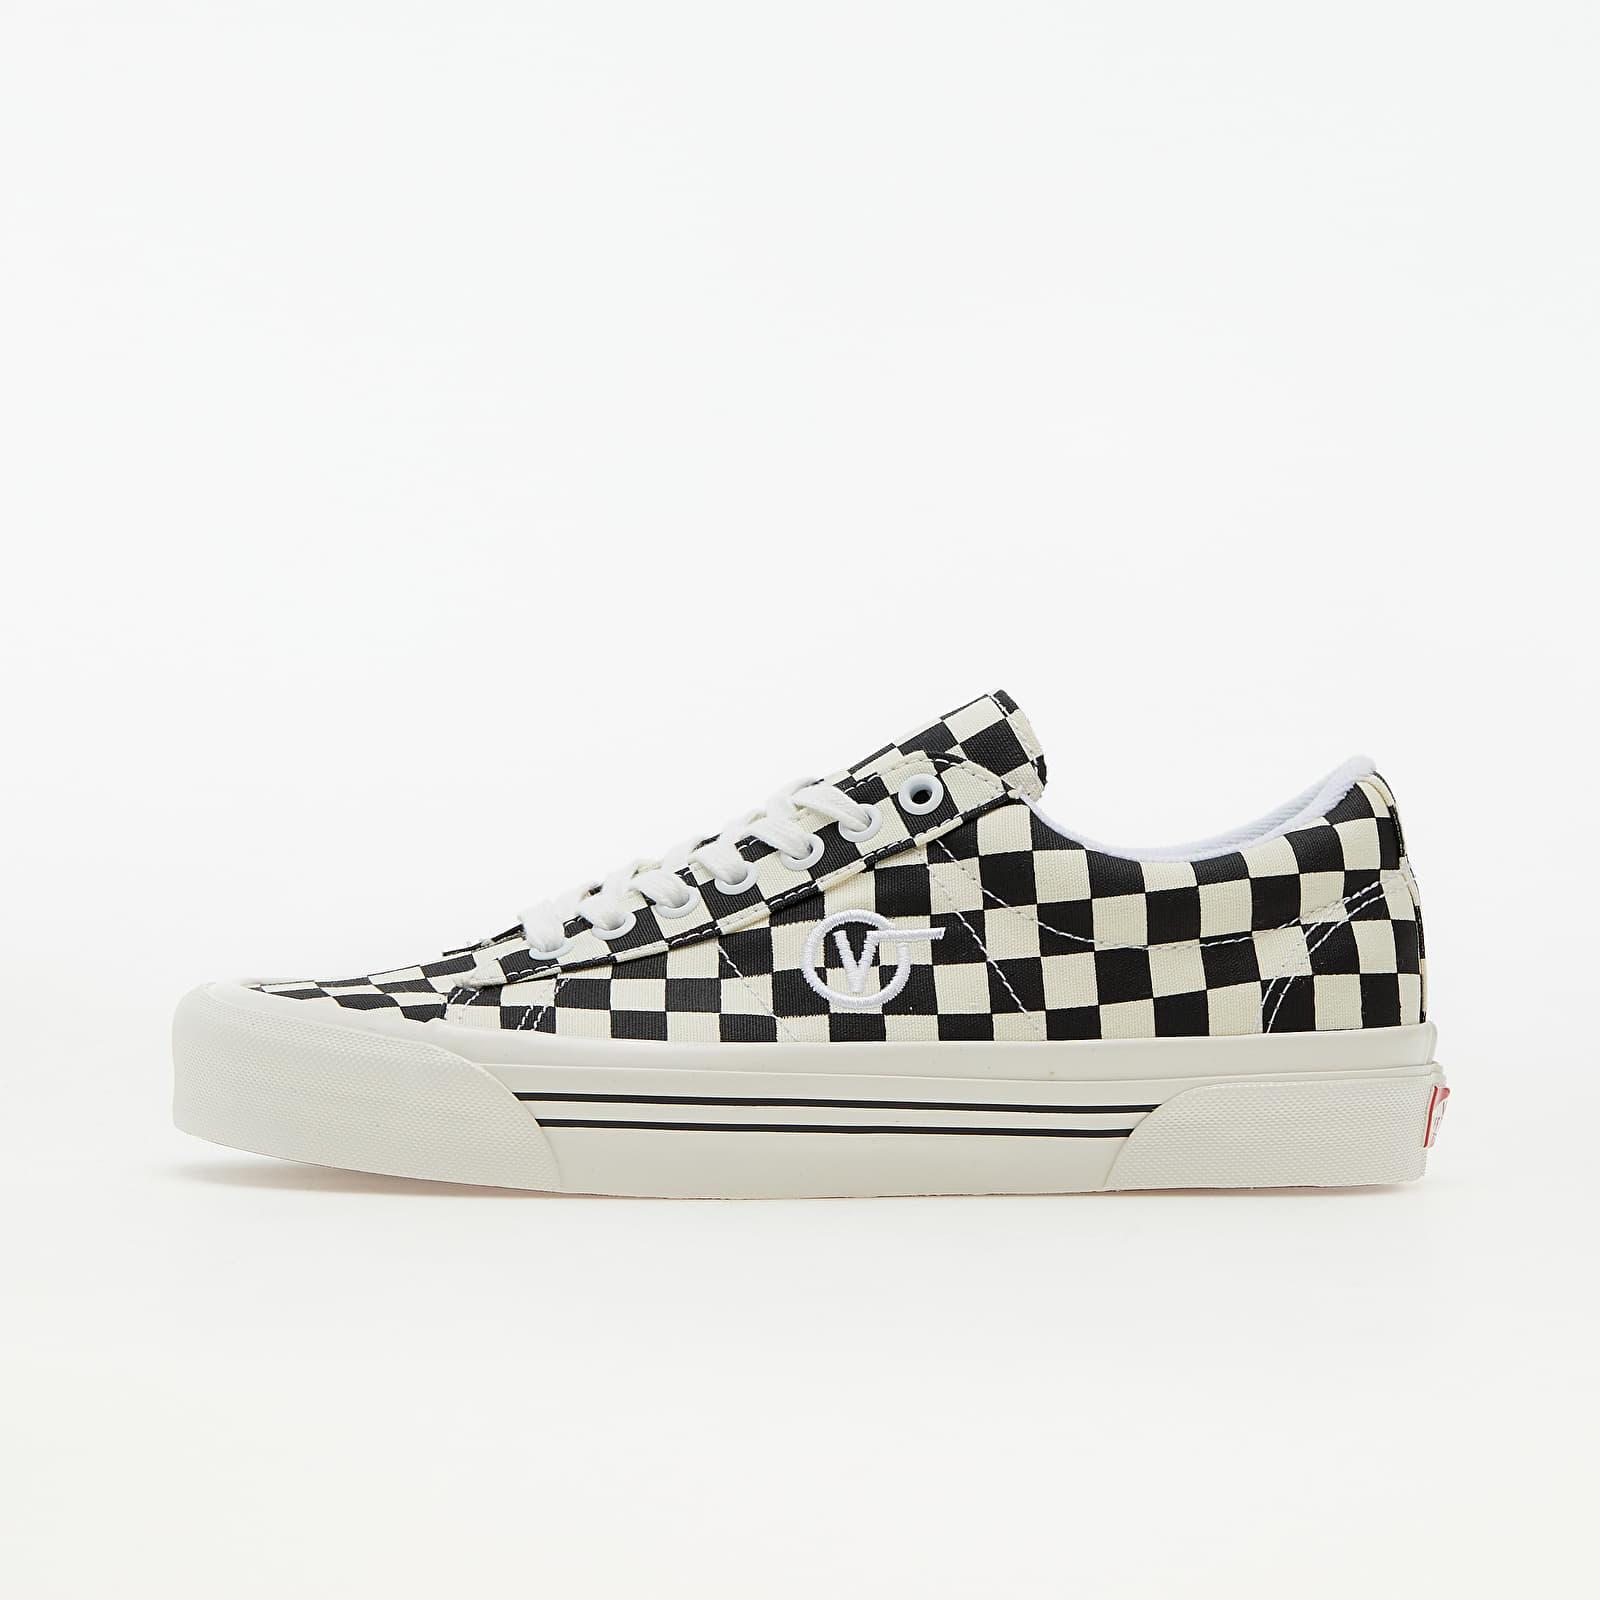 Vans Sid DX (Anaheim Factory) Og White/ Checkerboard VN0A4BTX4XR1